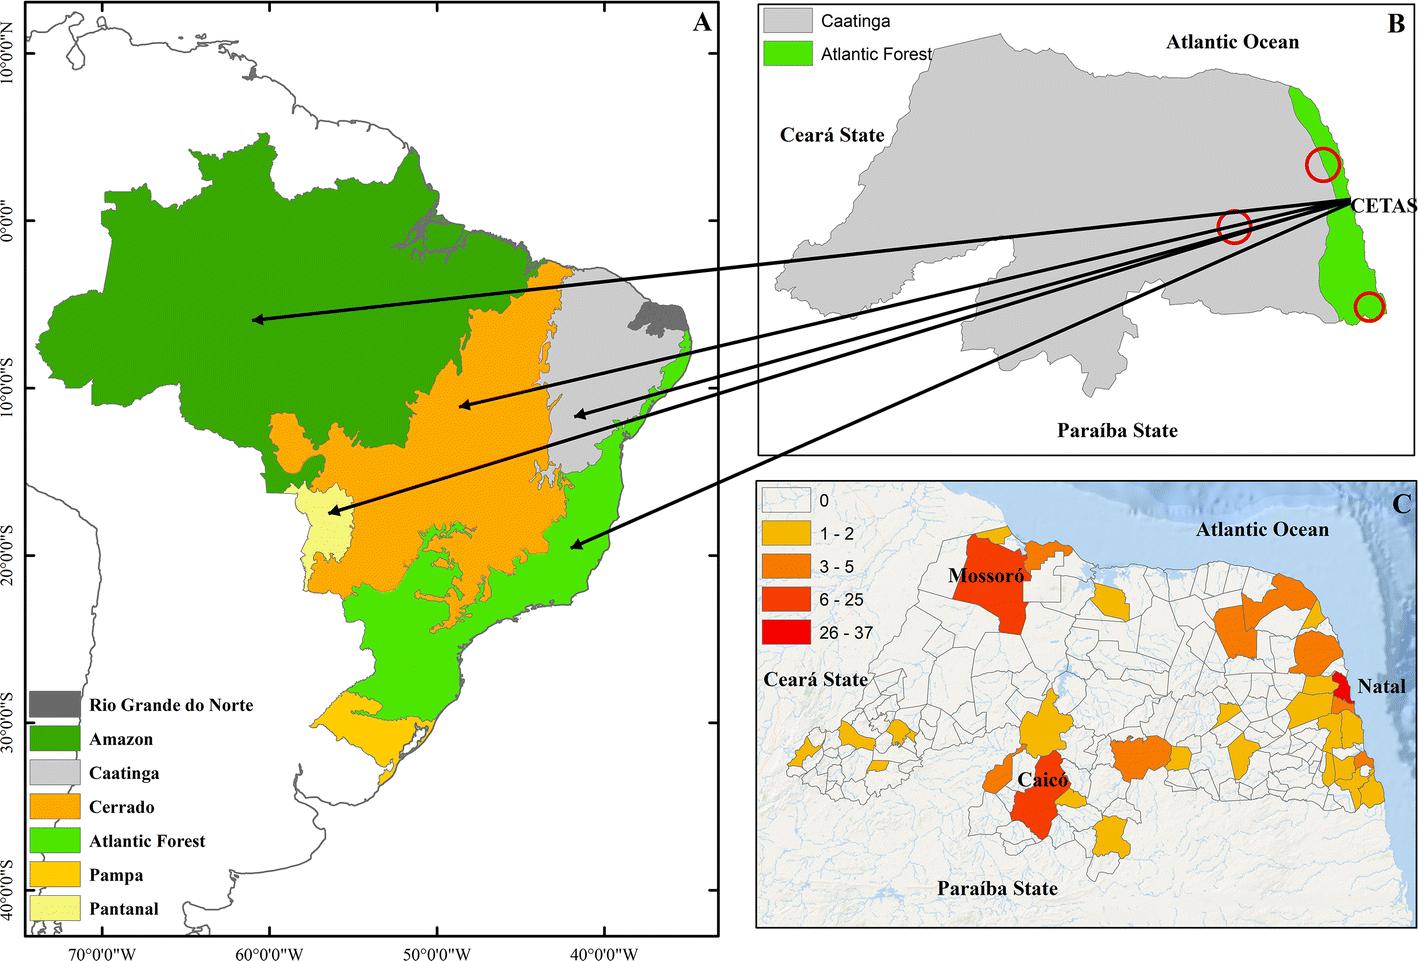 Wild animals seized in a state in Northeast Brazil: Where do